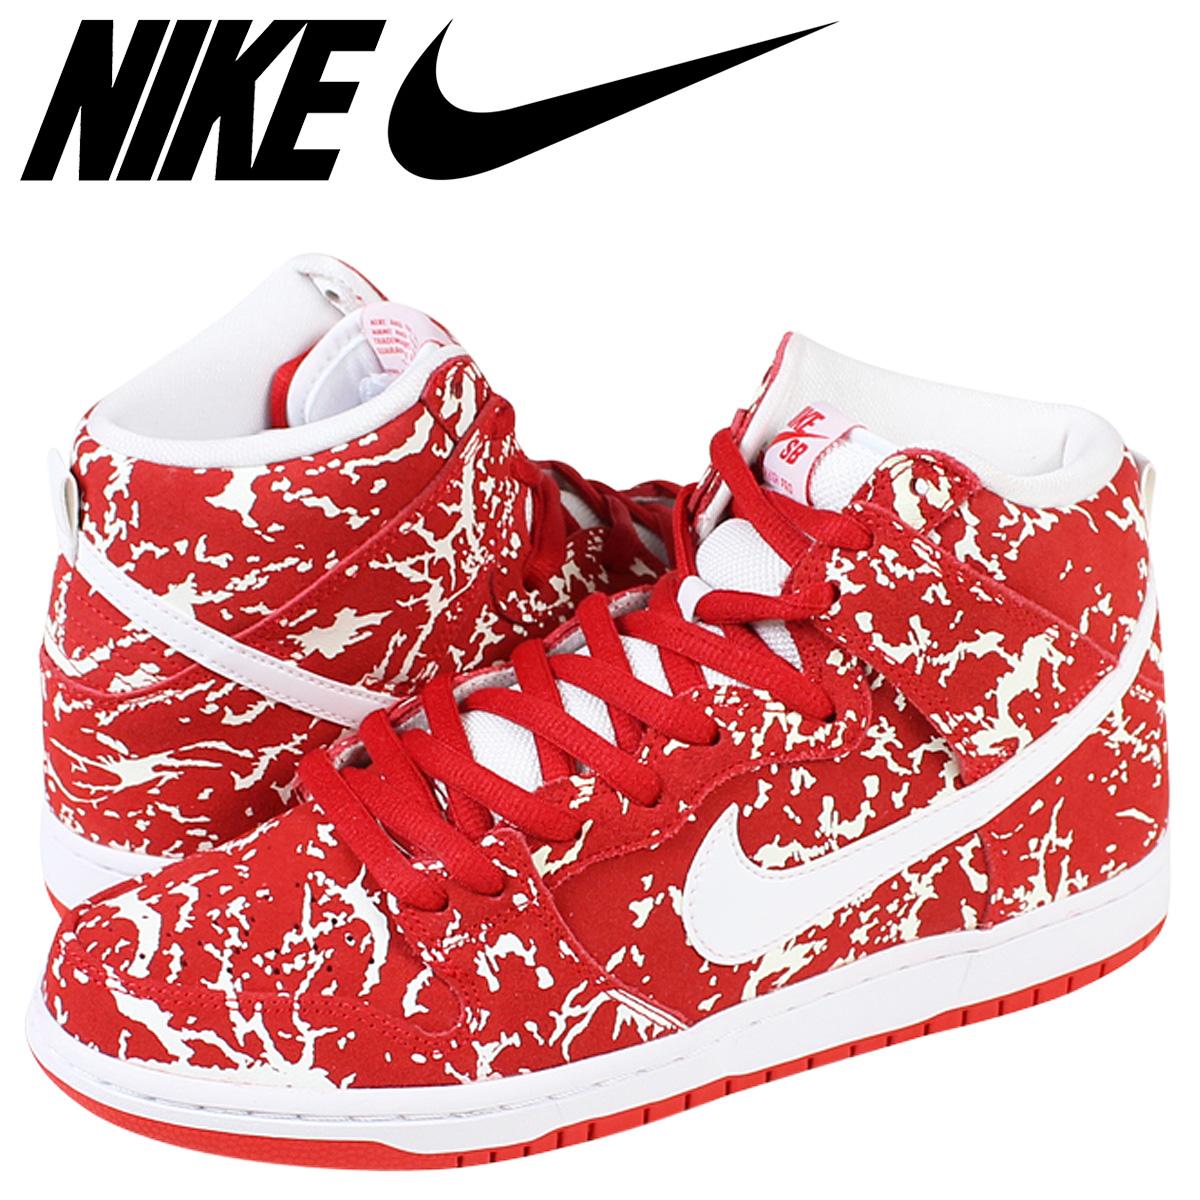 ecb492b64af8 ALLSPORTS  NIKE SB Nike Dunk DUNK HIGH PREMIUM RAW MEAT dunk Hi ...